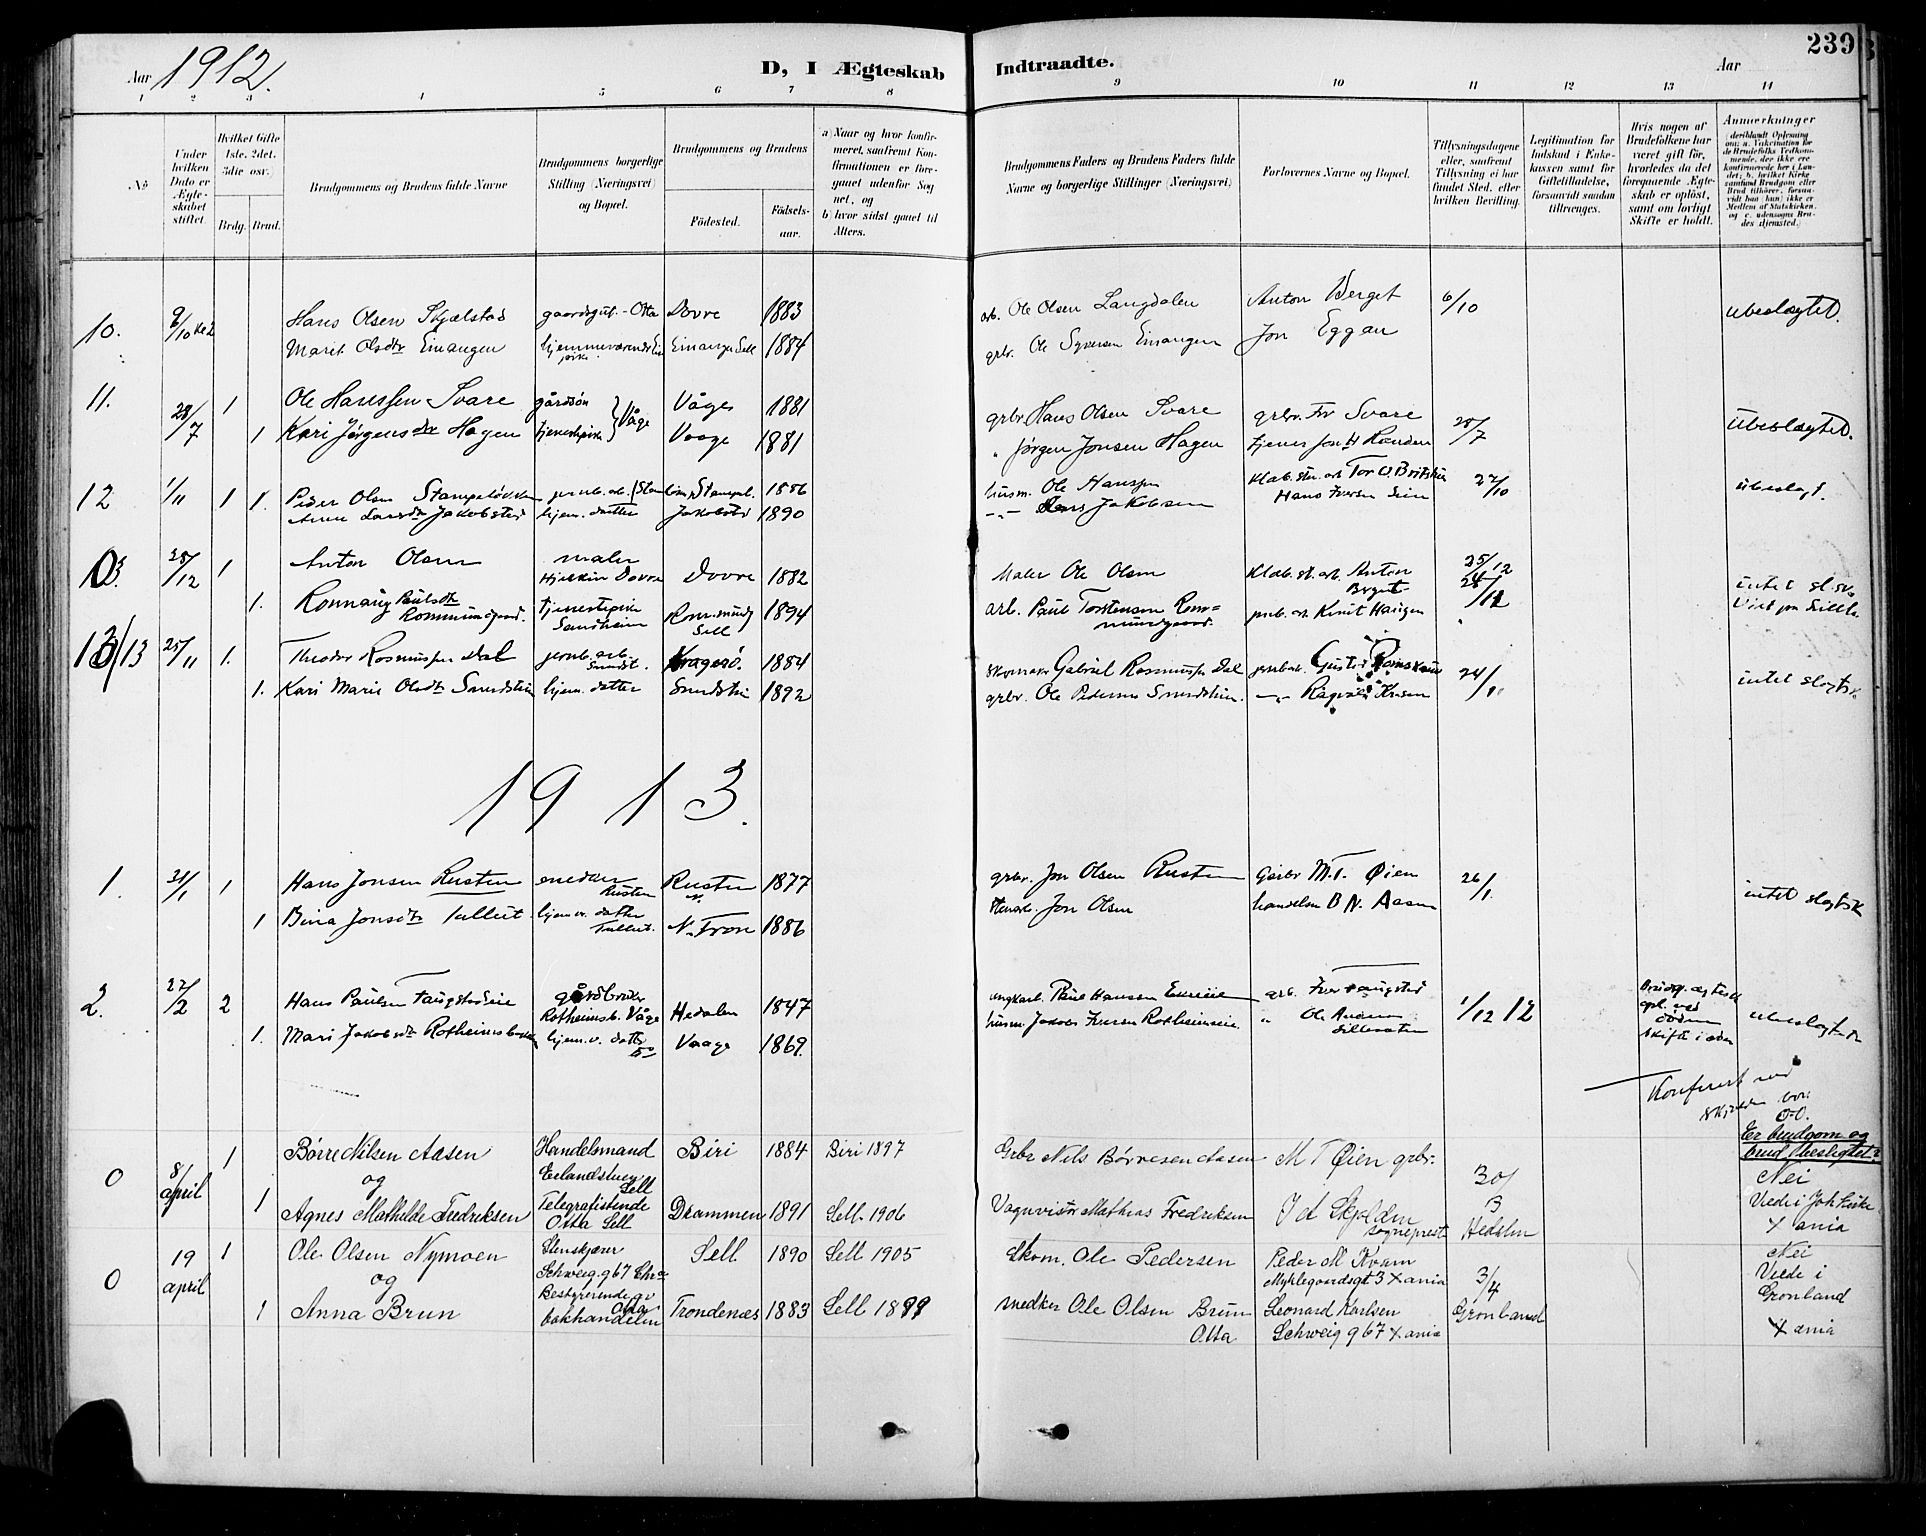 SAH, Sel prestekontor, Klokkerbok nr. 1, 1894-1923, s. 239